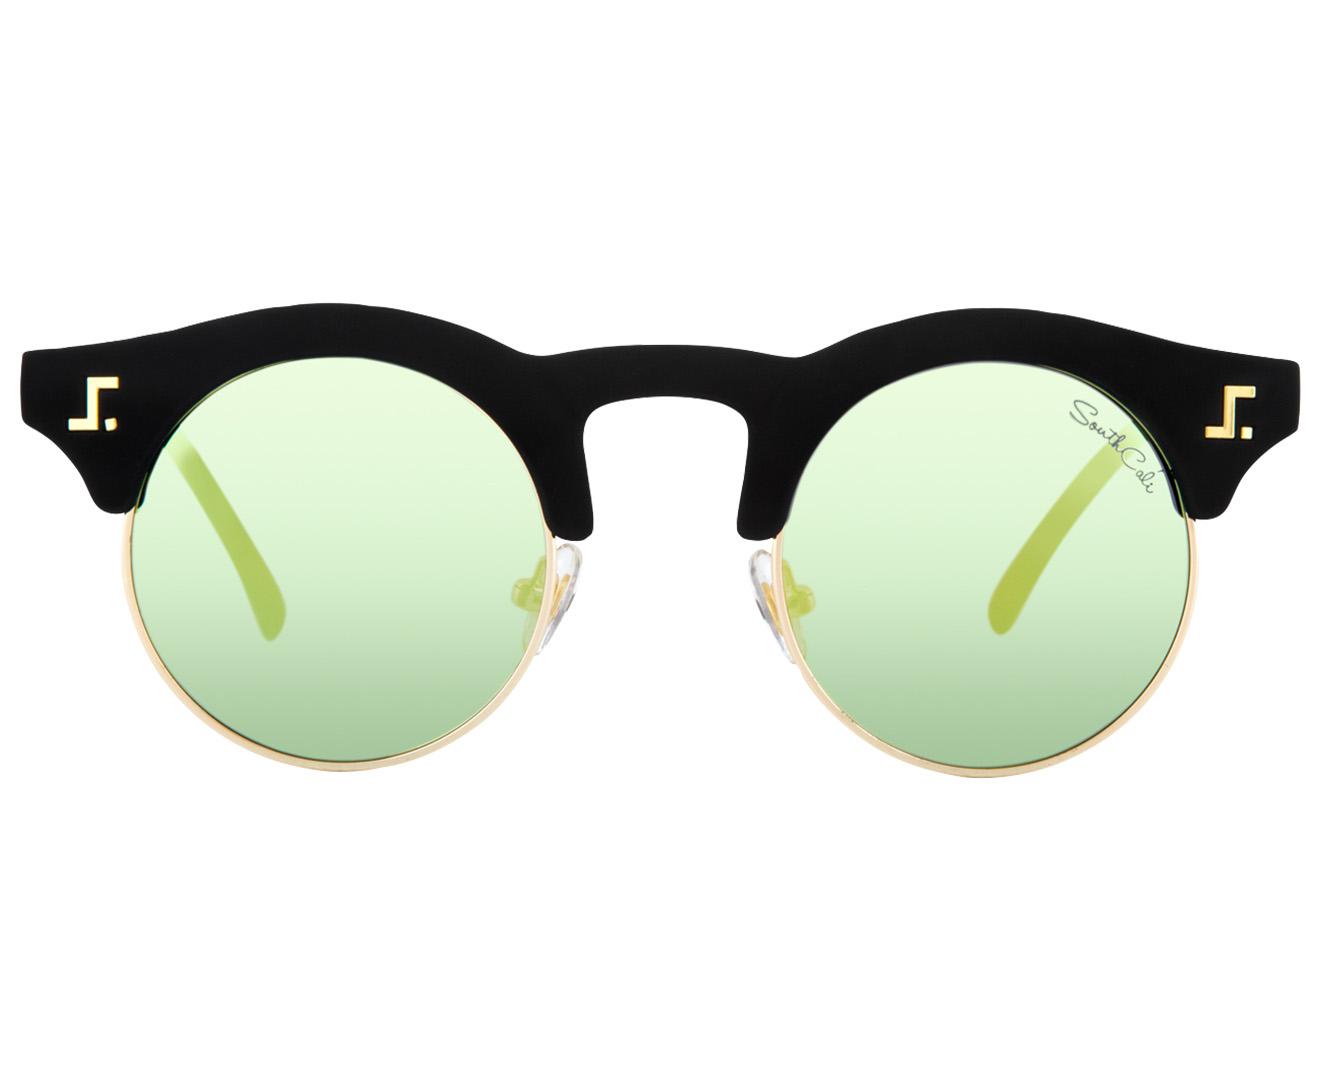 8055beacc8 South Cali Venice Polarised Sunglasses - Matte Black Palm Green Mirror